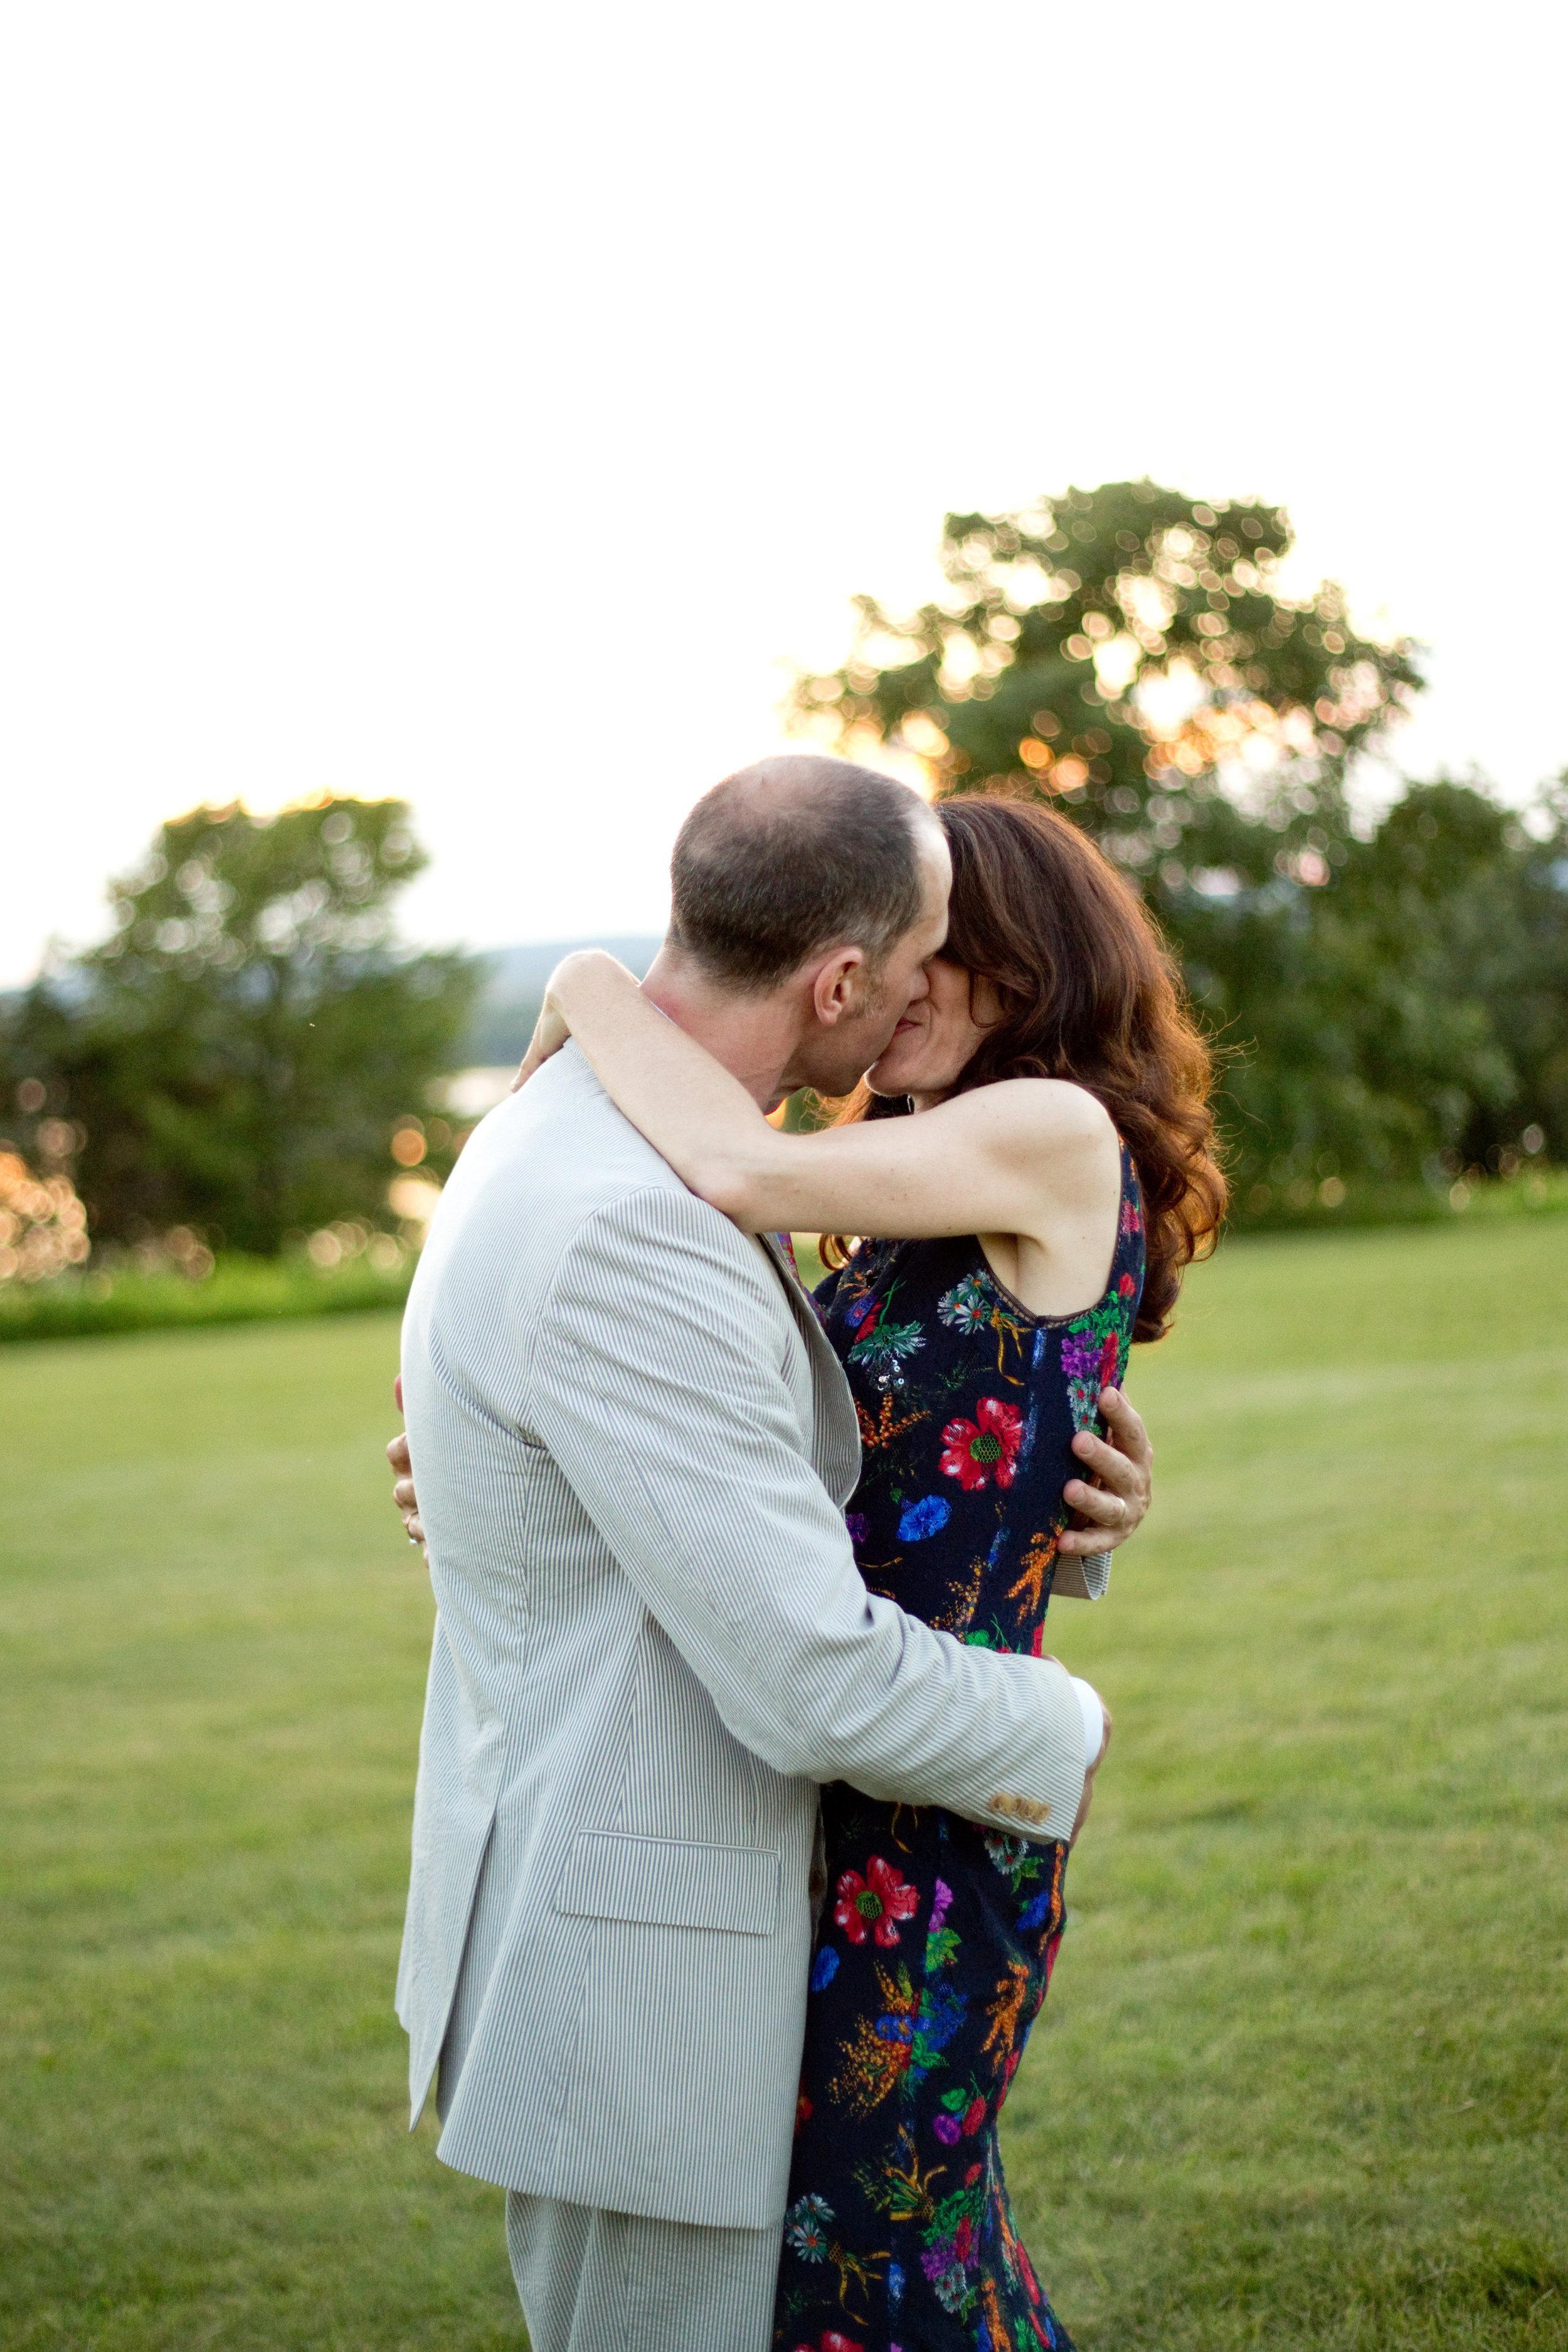 Gwen and Robert-Couple Photos-0055.jpg